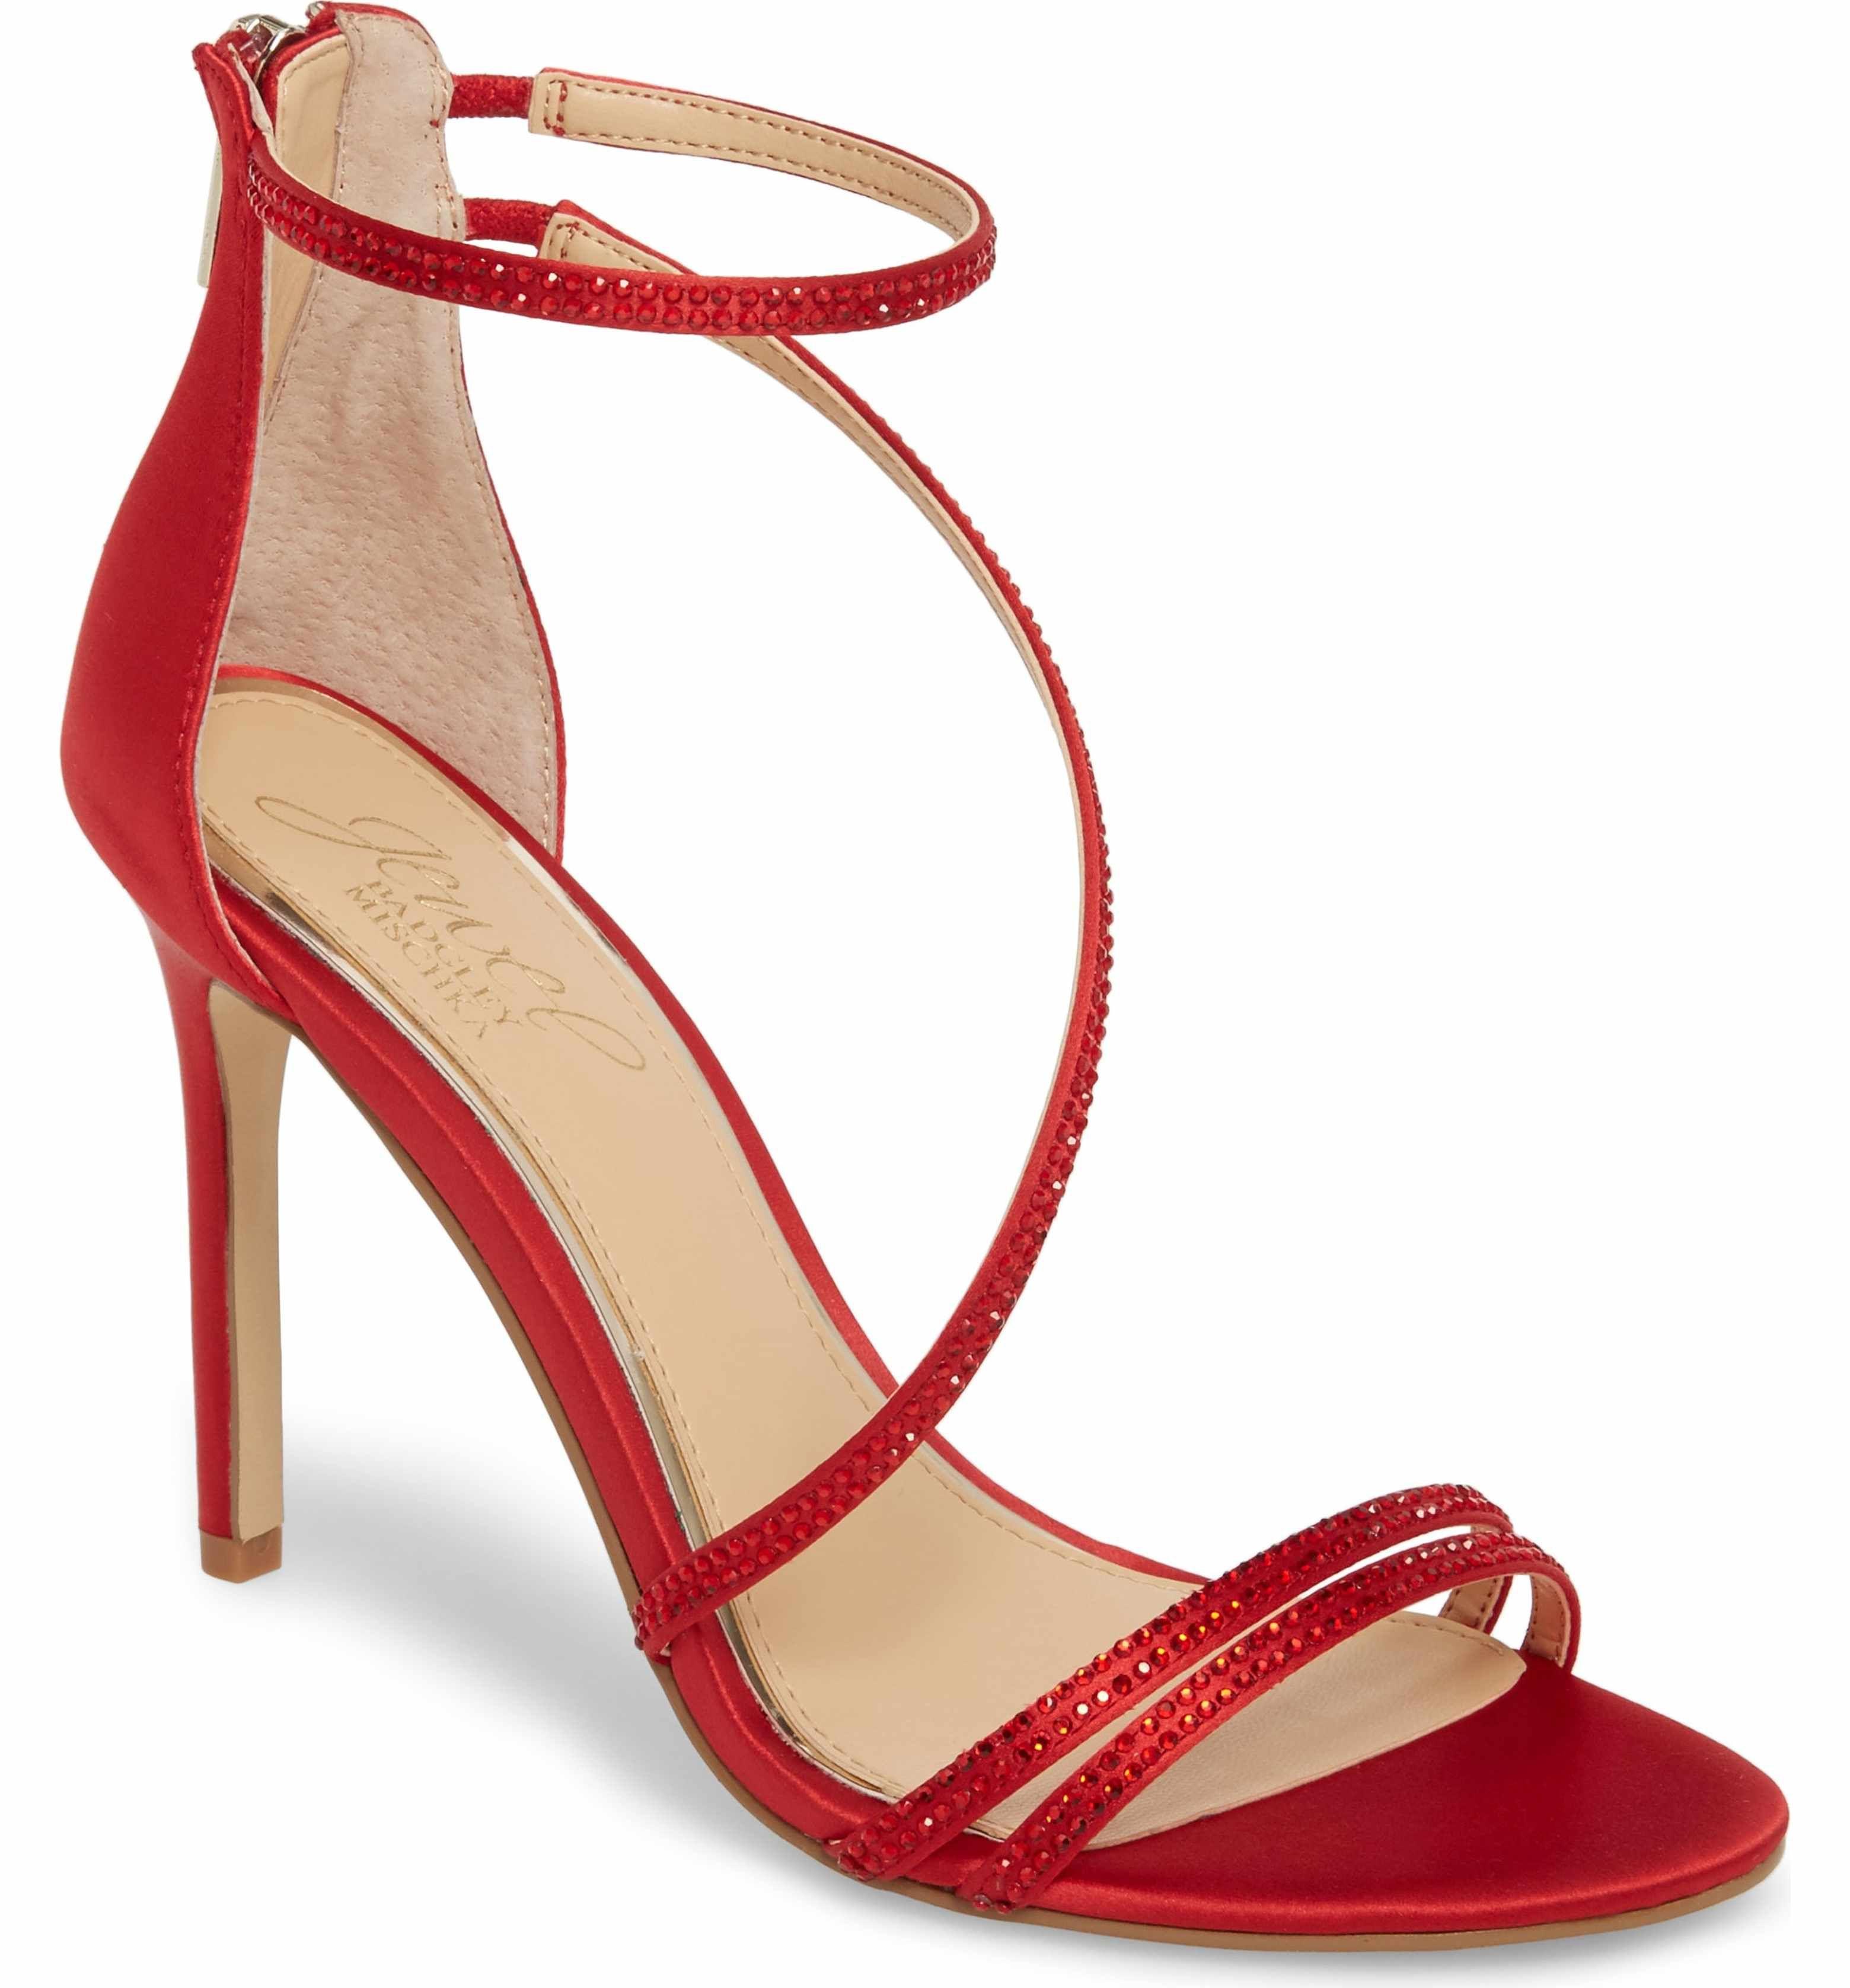 f07e772688c Main Image - Jewel Badgley Mischka Gail Crystal Embellished Sandal (Women)